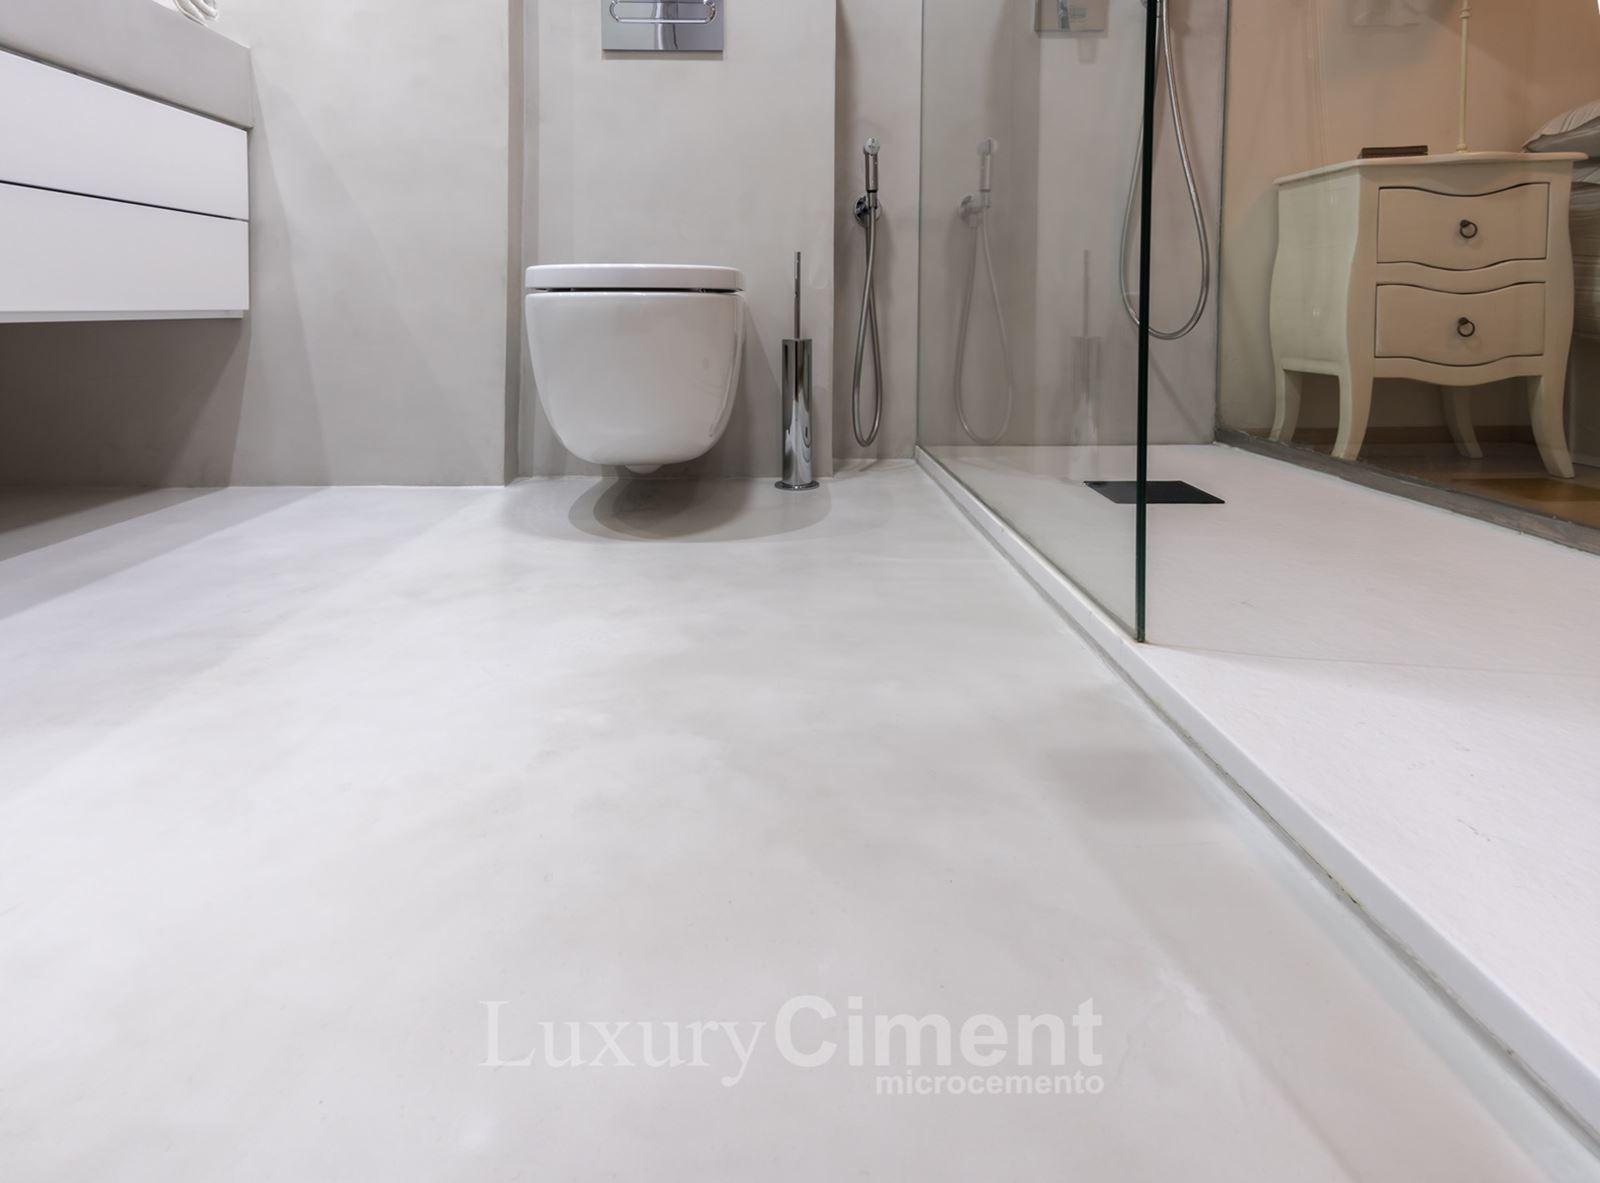 Microcemento en suelos paredes ba os cocinas para - Suelos para bano ...